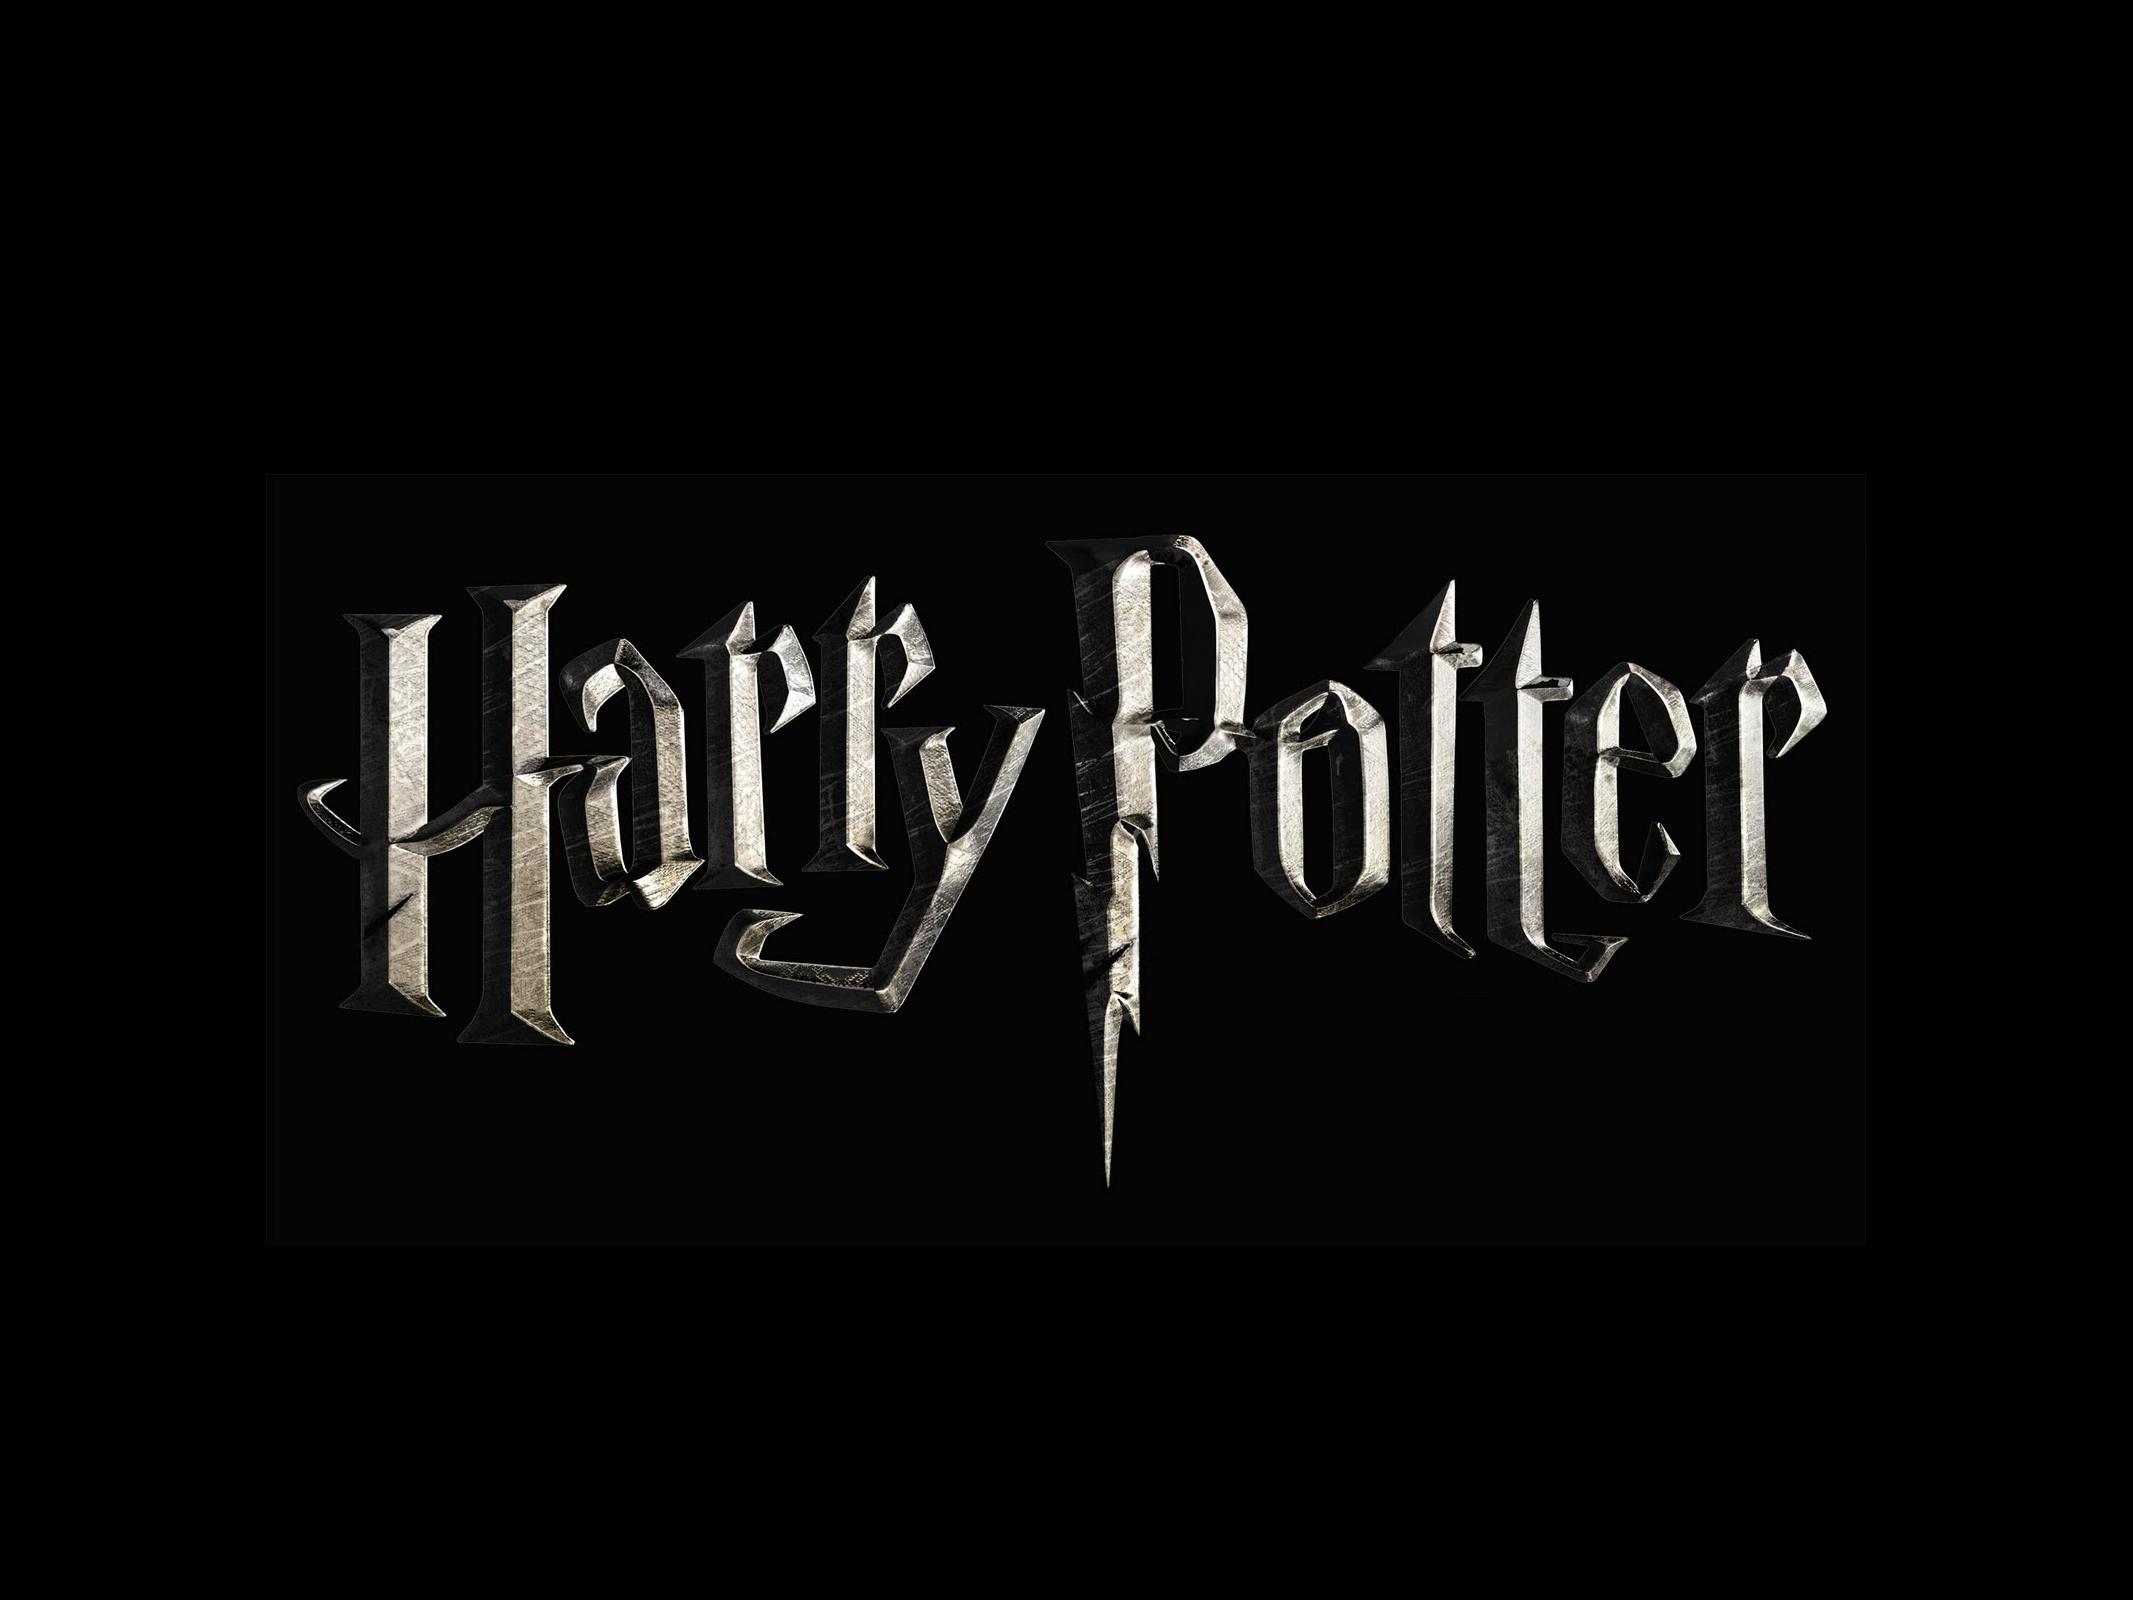 Download Wallpaper Harry Potter Black - 8228f1e1babd316056abf2c11ebc4059  2018_959661.jpg